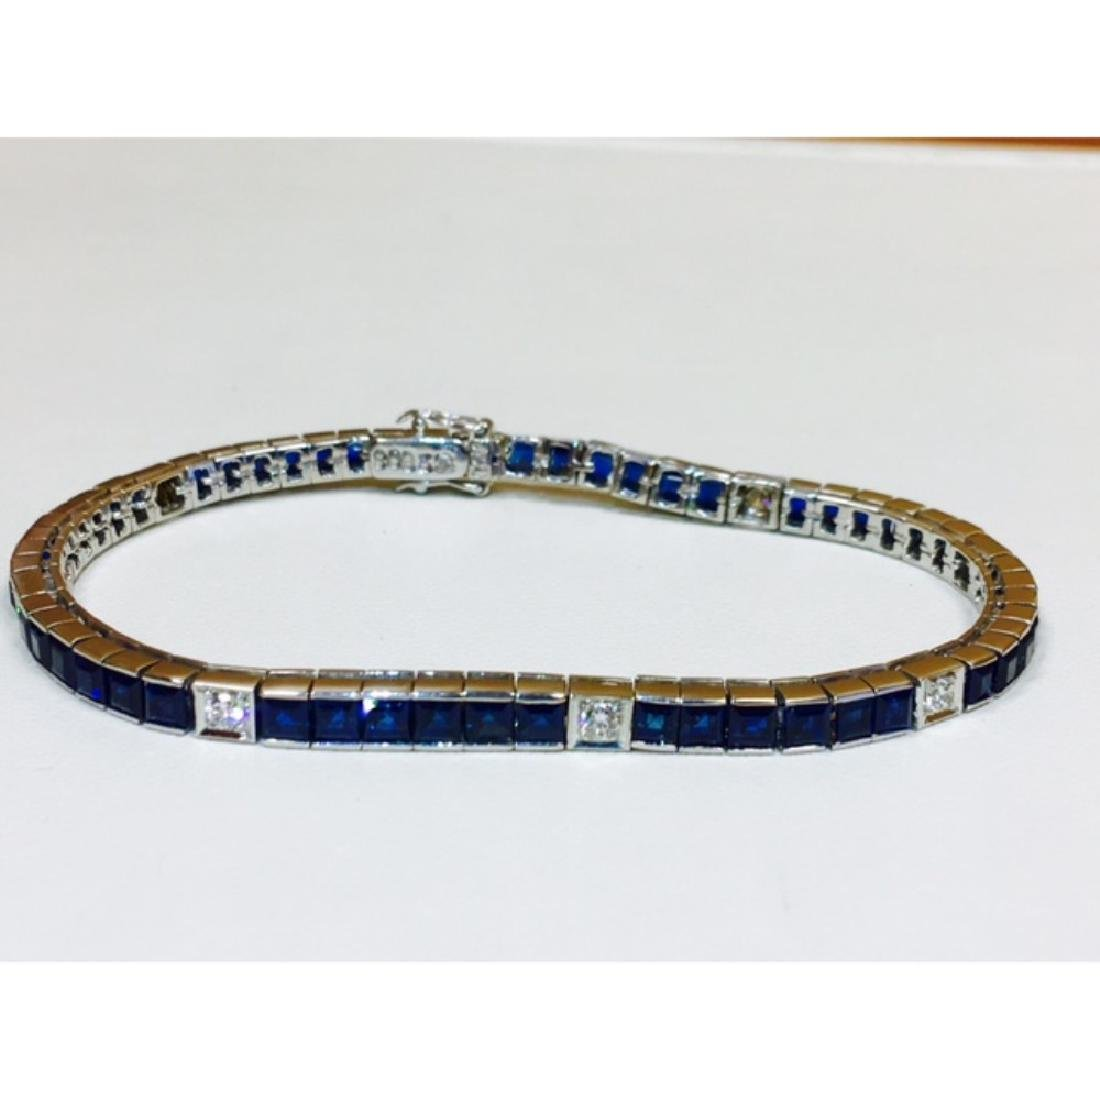 18K, 4.00 Carat Blue Sapphire and Diamond Bracelet